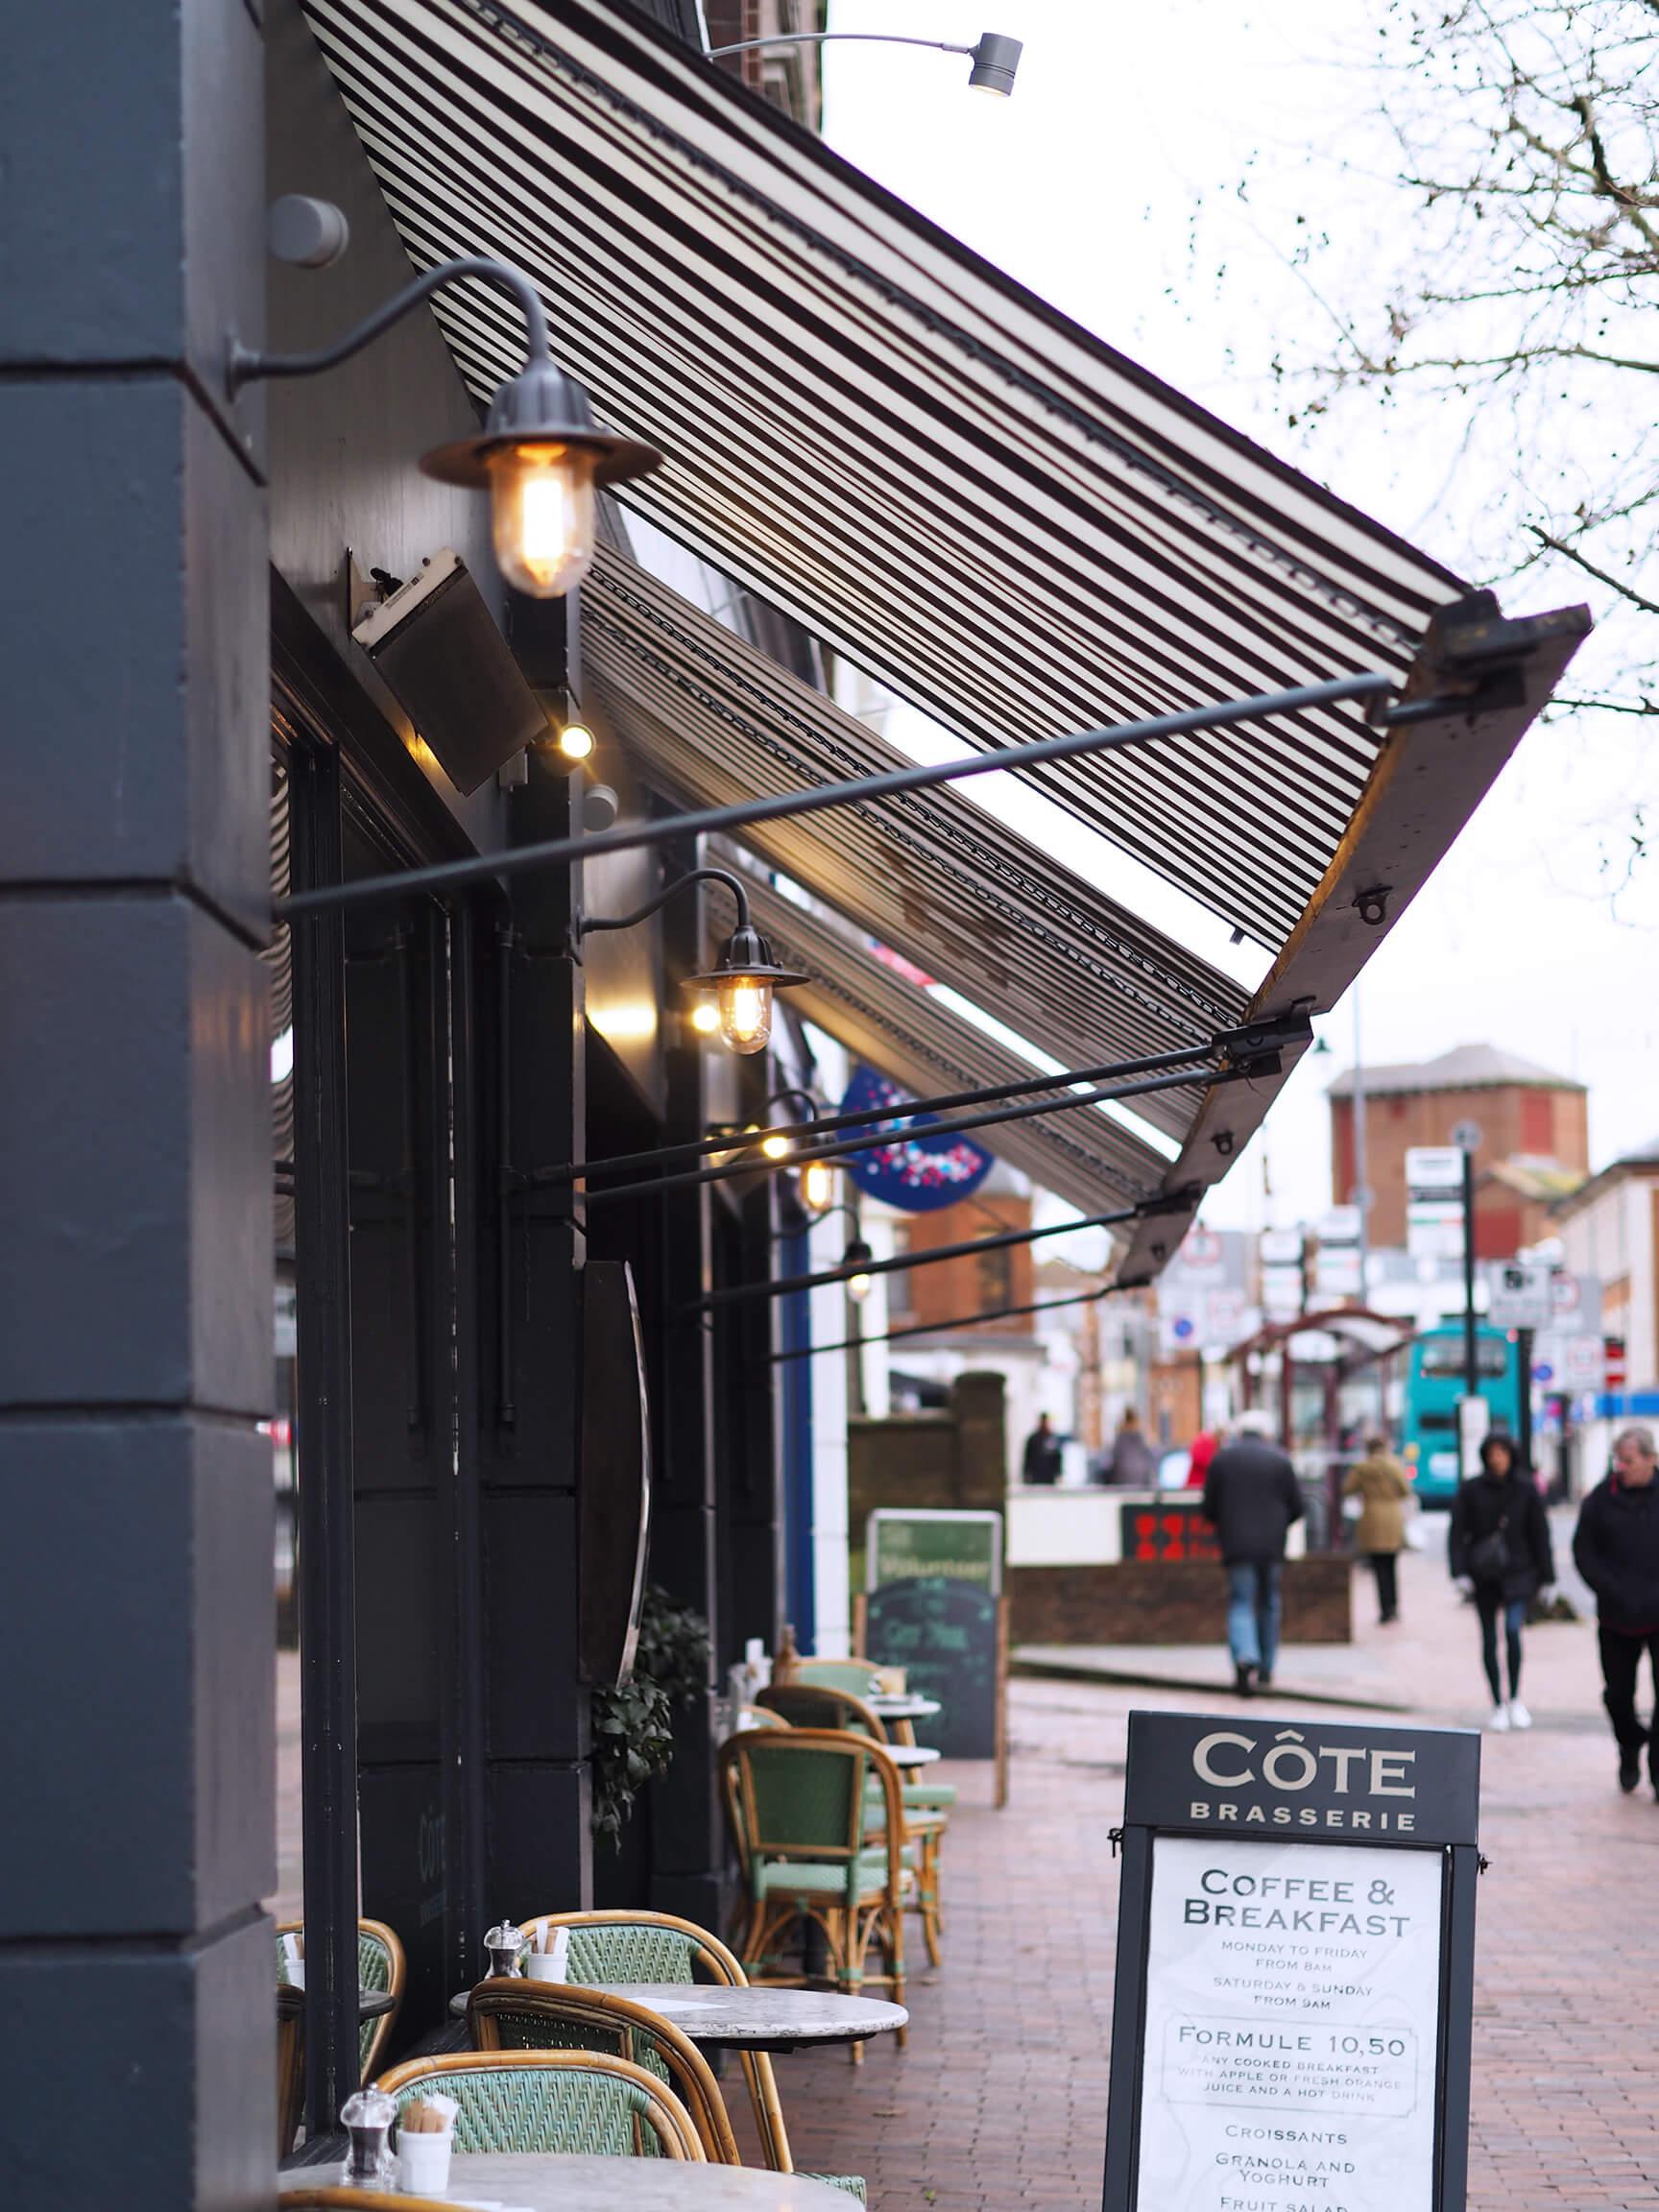 tunbridge-wells-cafe-1.jpg